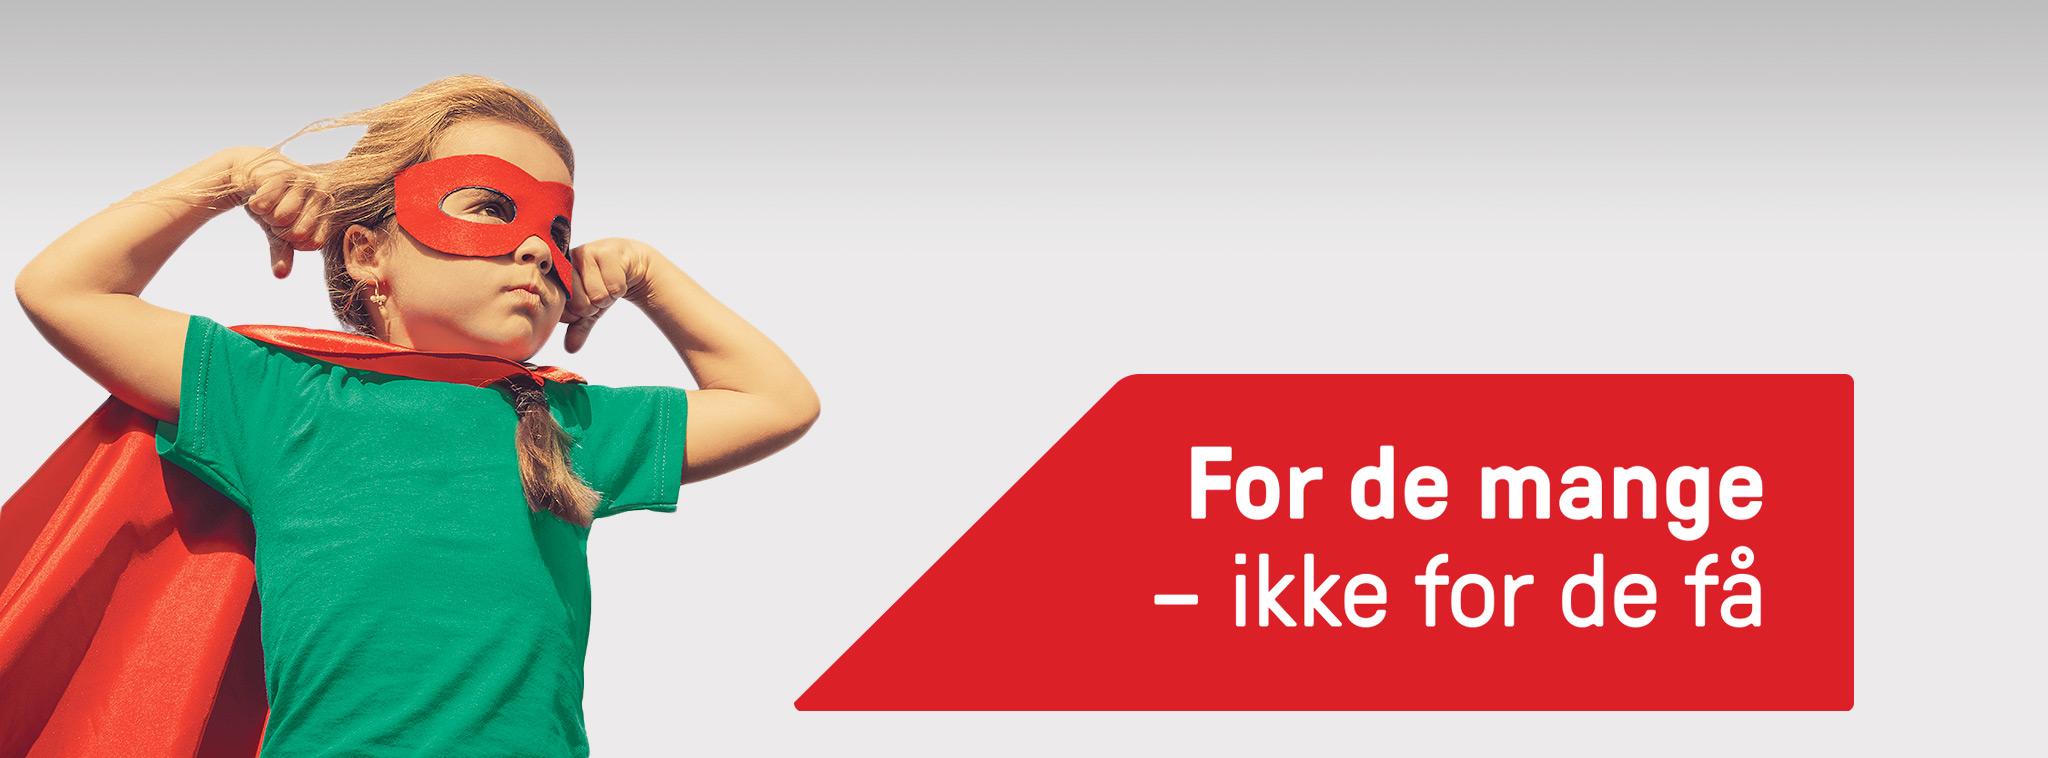 Førsteutkast til fylkesvalgsprogram for Møre og Romsdal SV 2019-2023